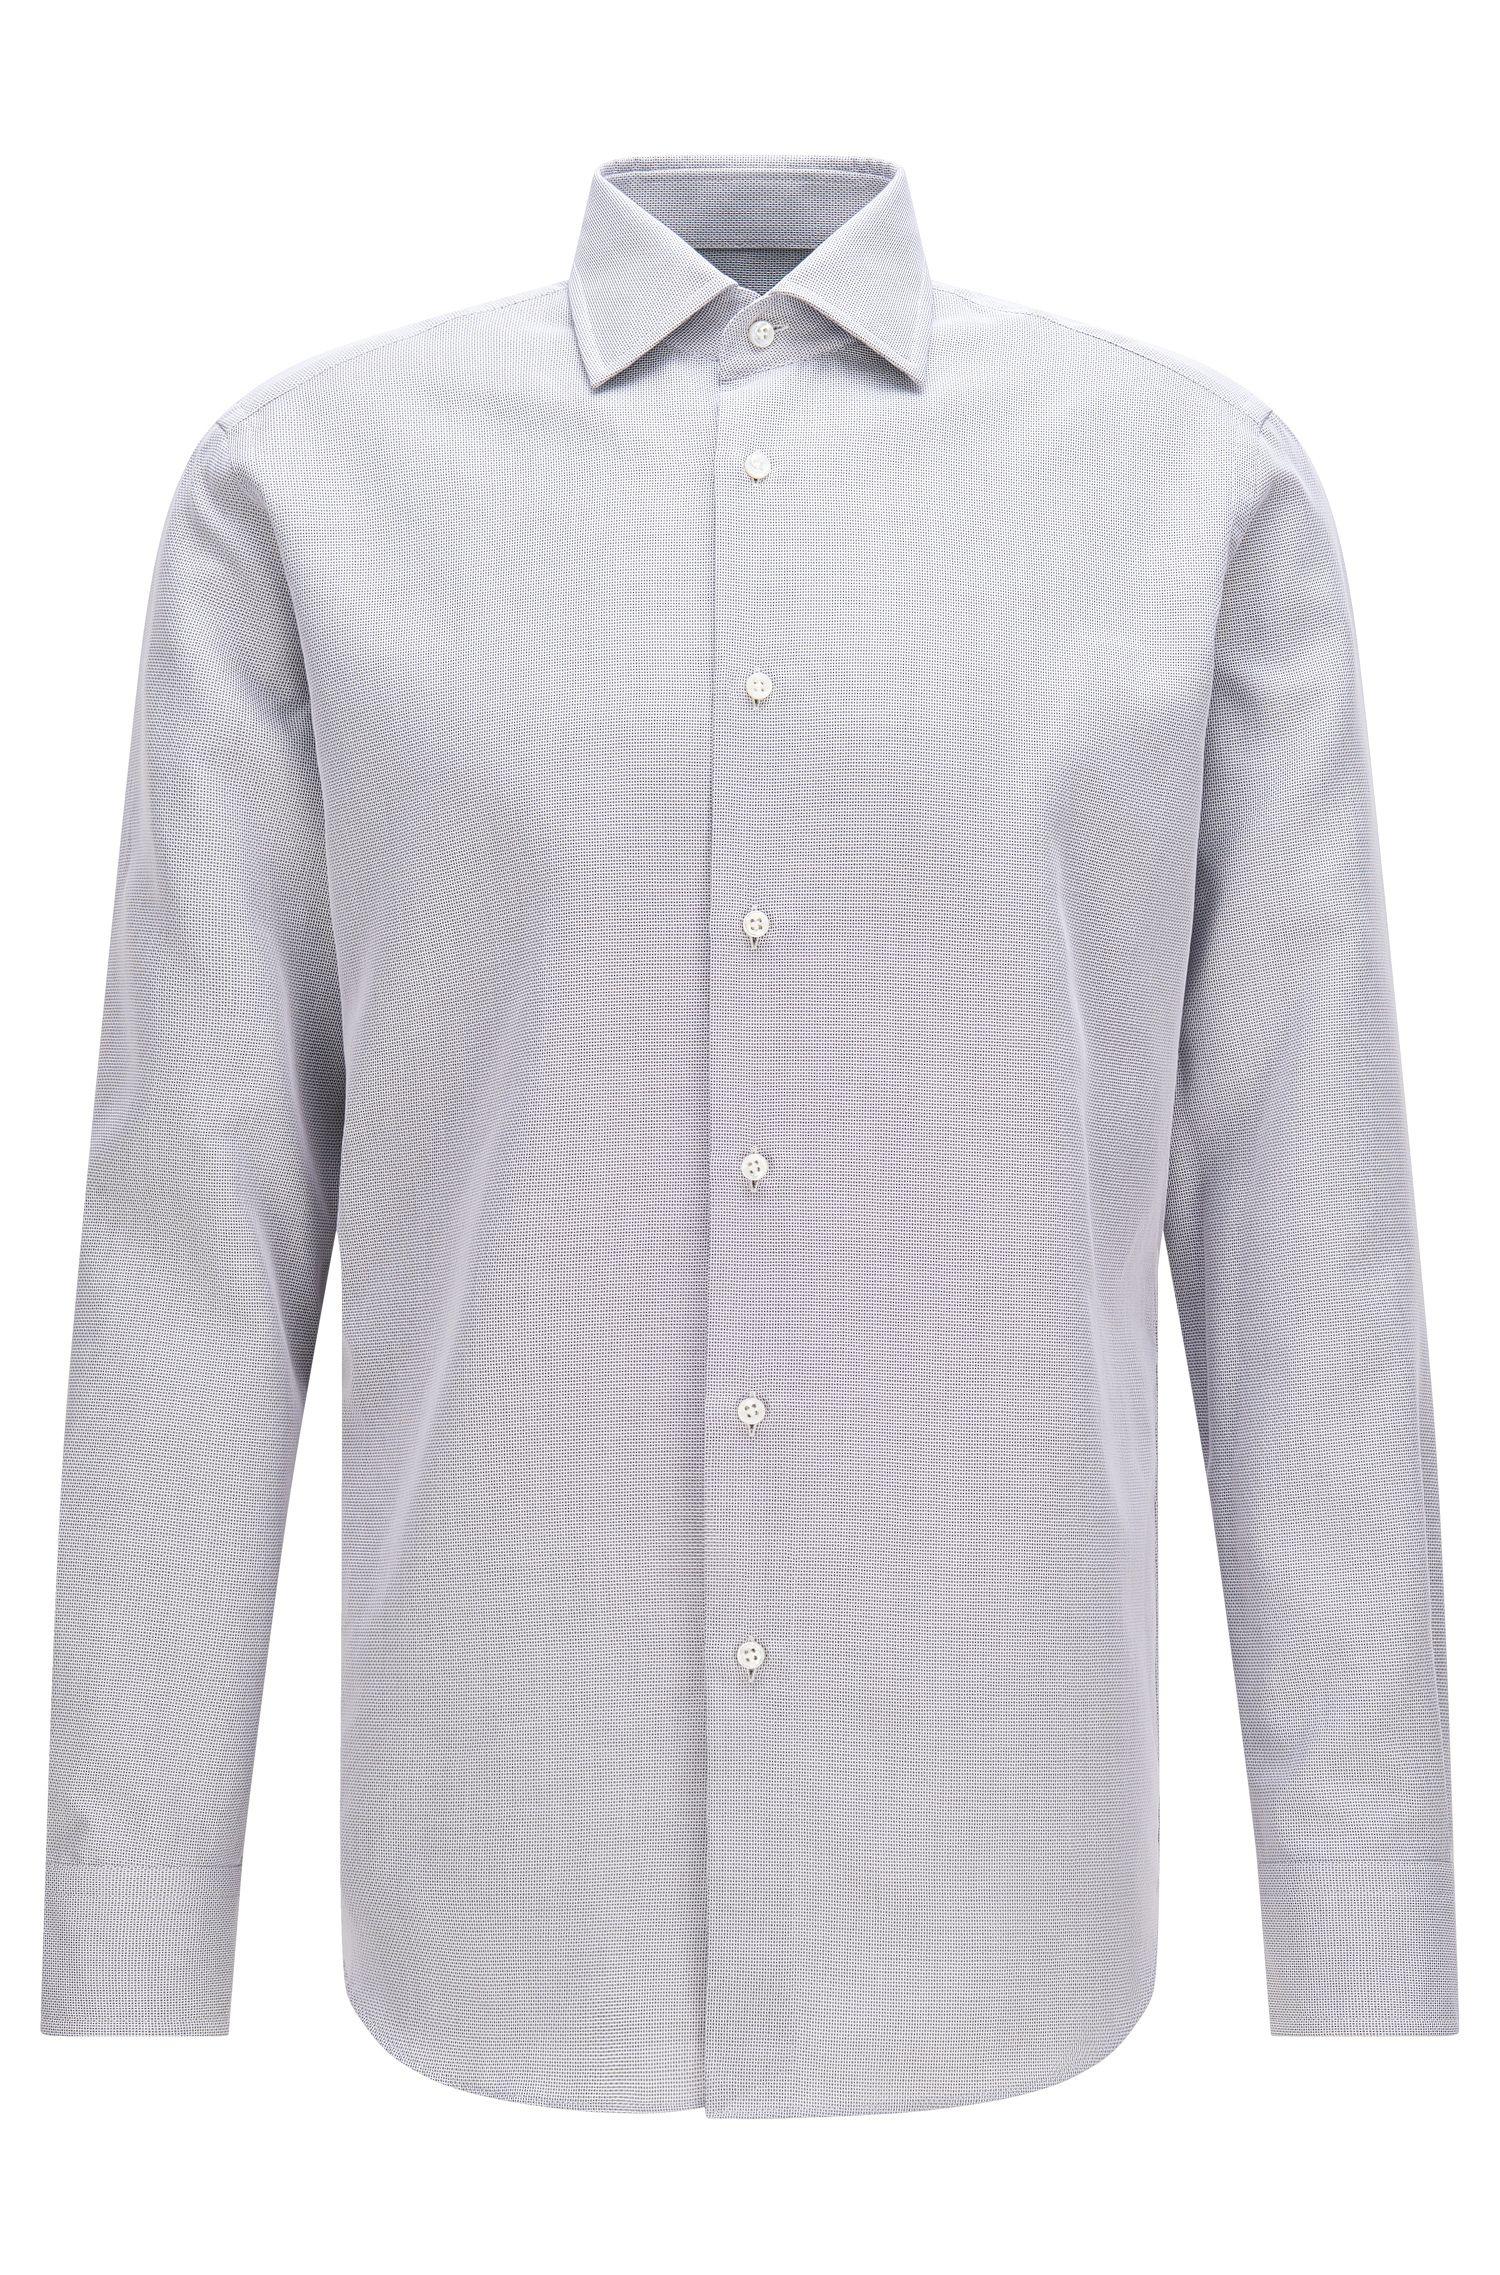 End-on-End Cotton Dress Shirt, Regular Fit | T-Stuart, Dark Grey